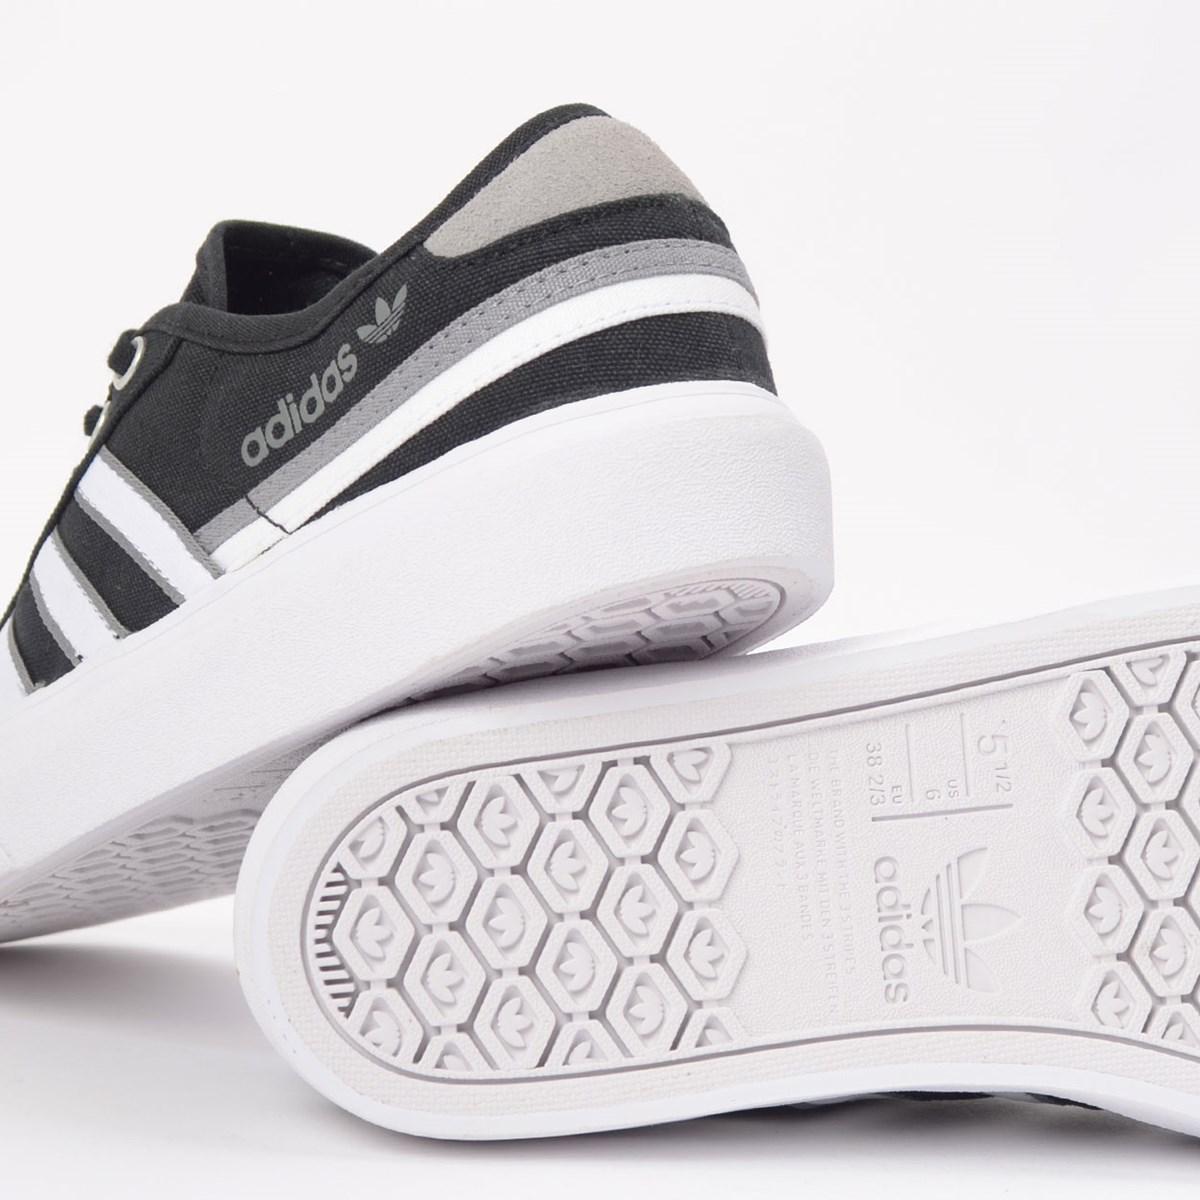 Tênis adidas Delpala Core Black Ftwr White FW4240